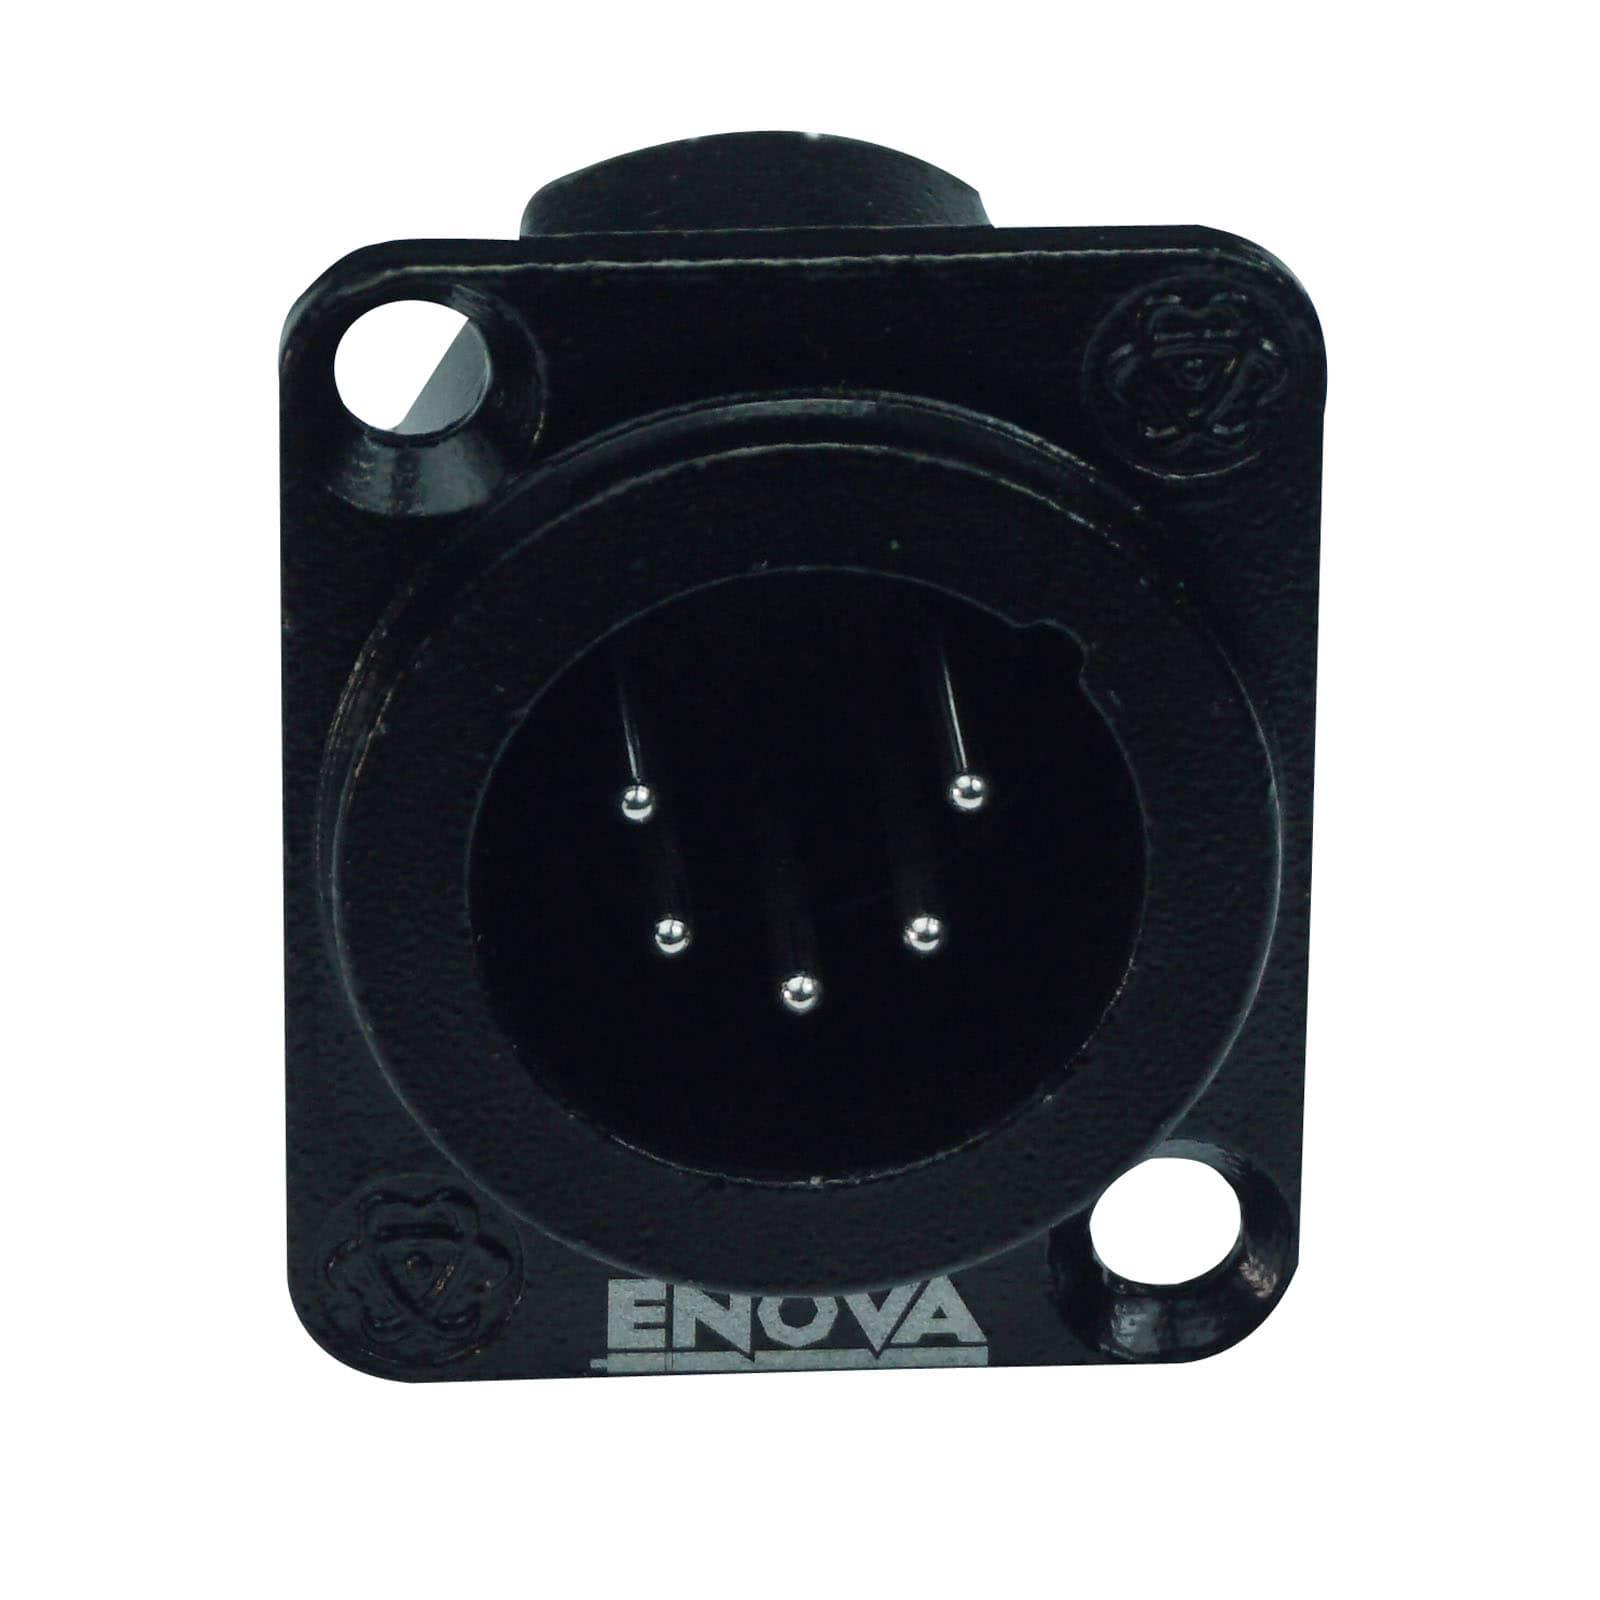 Miniatur-Klinkenstecker mono 2,5 mm 2-polig Jack Plug Lötanschluss 2 Stück